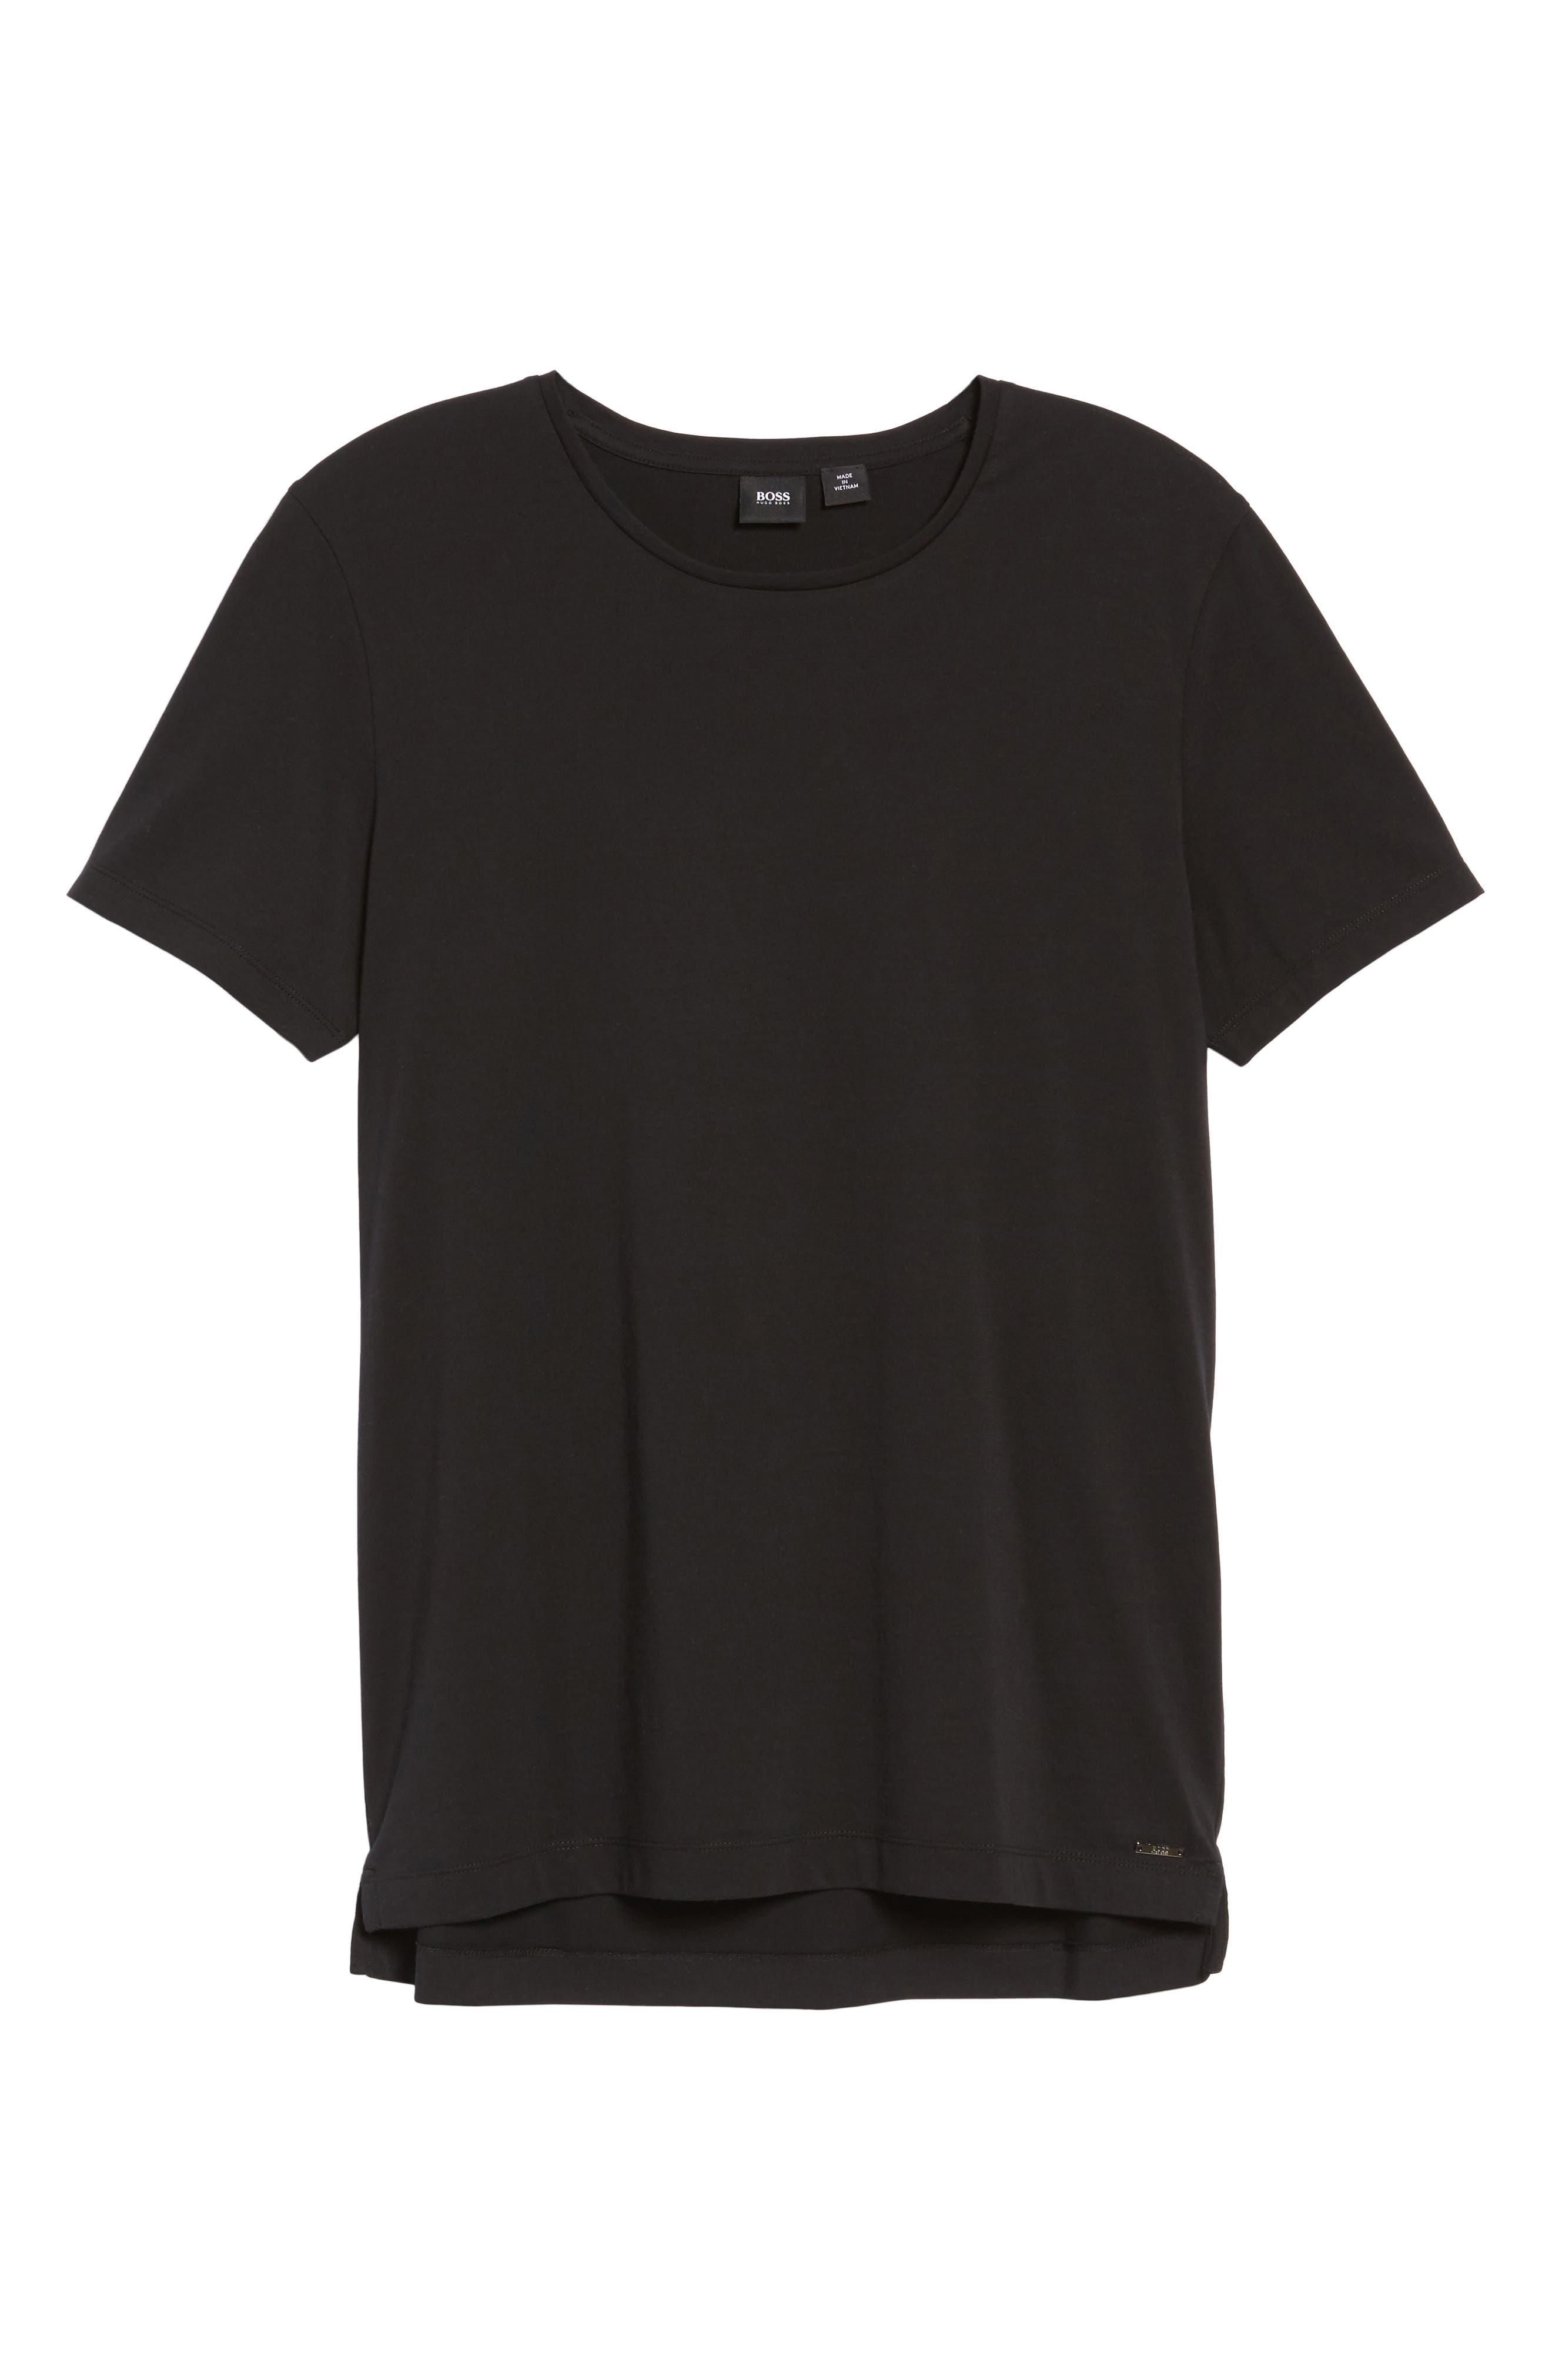 Tessler Crewneck T-Shirt,                             Alternate thumbnail 15, color,                             Black